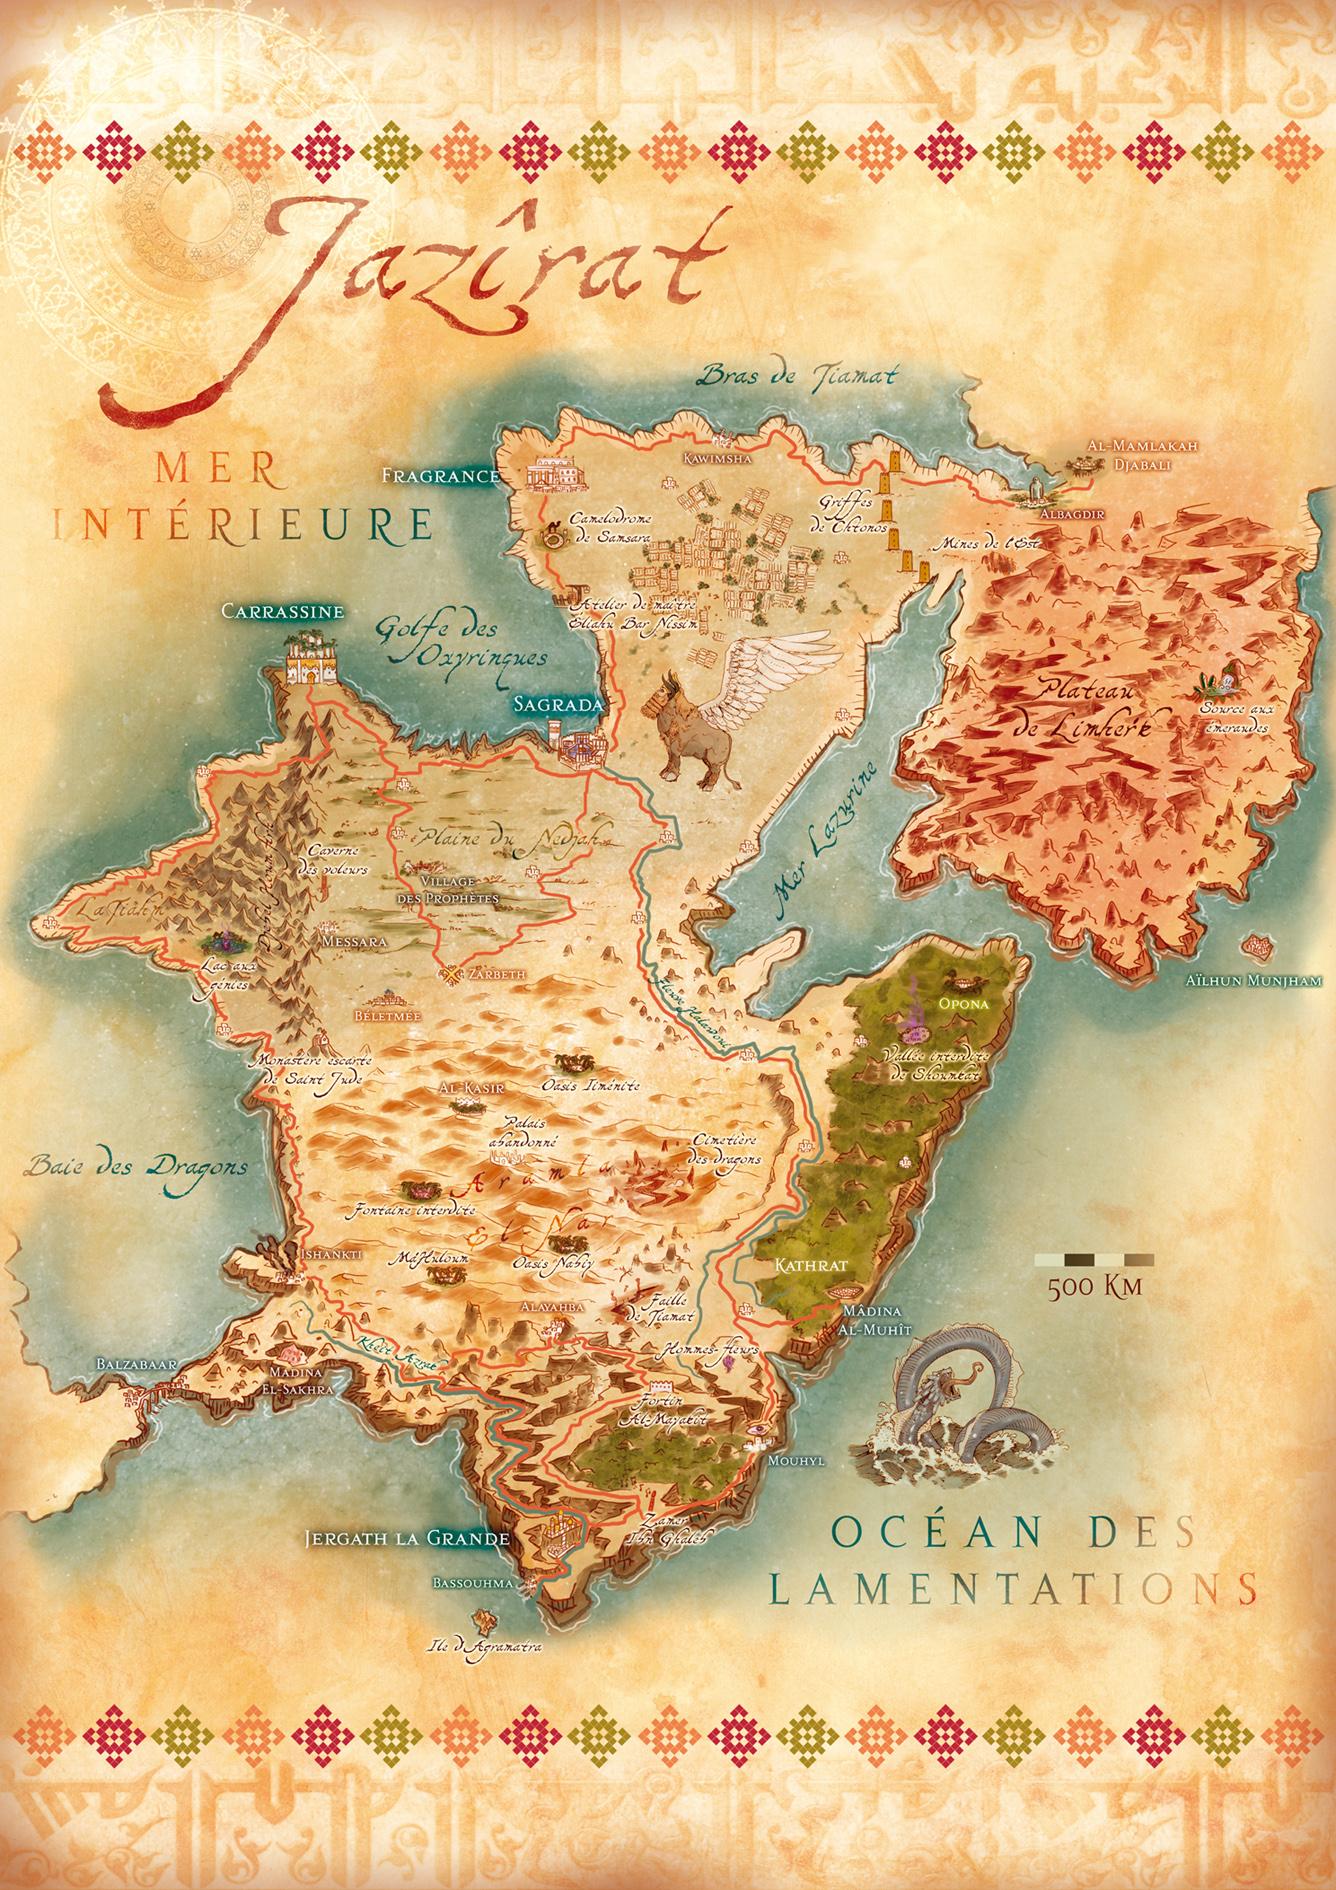 Création d'une table sur Capharnaüm  Capharnaum-carte-jazirat